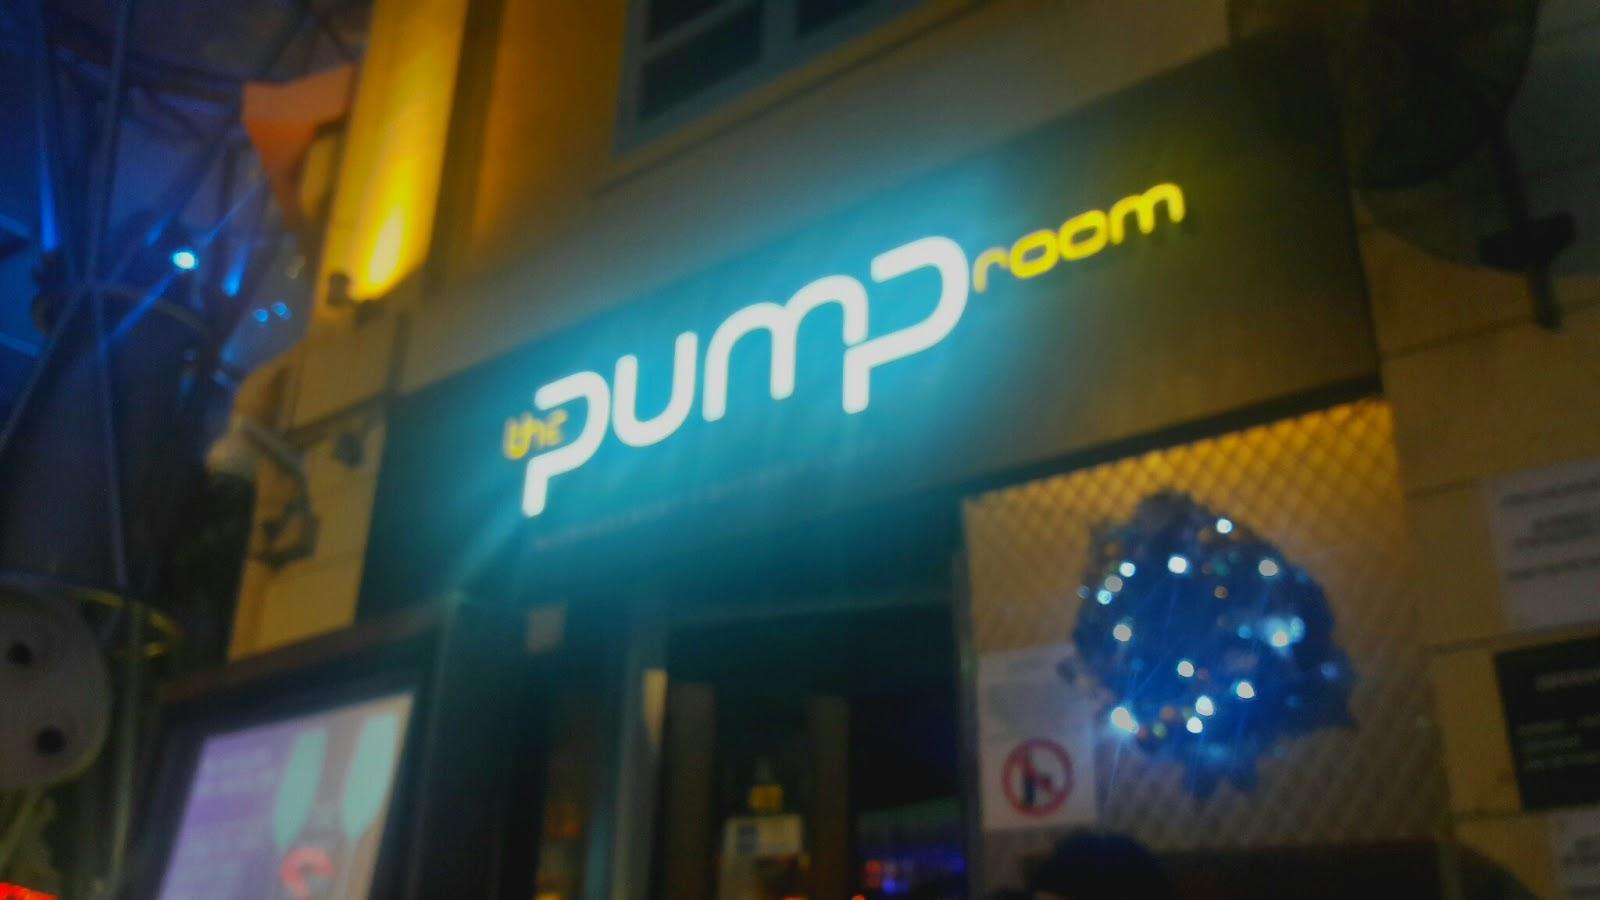 Pump Room Singapore Live Band